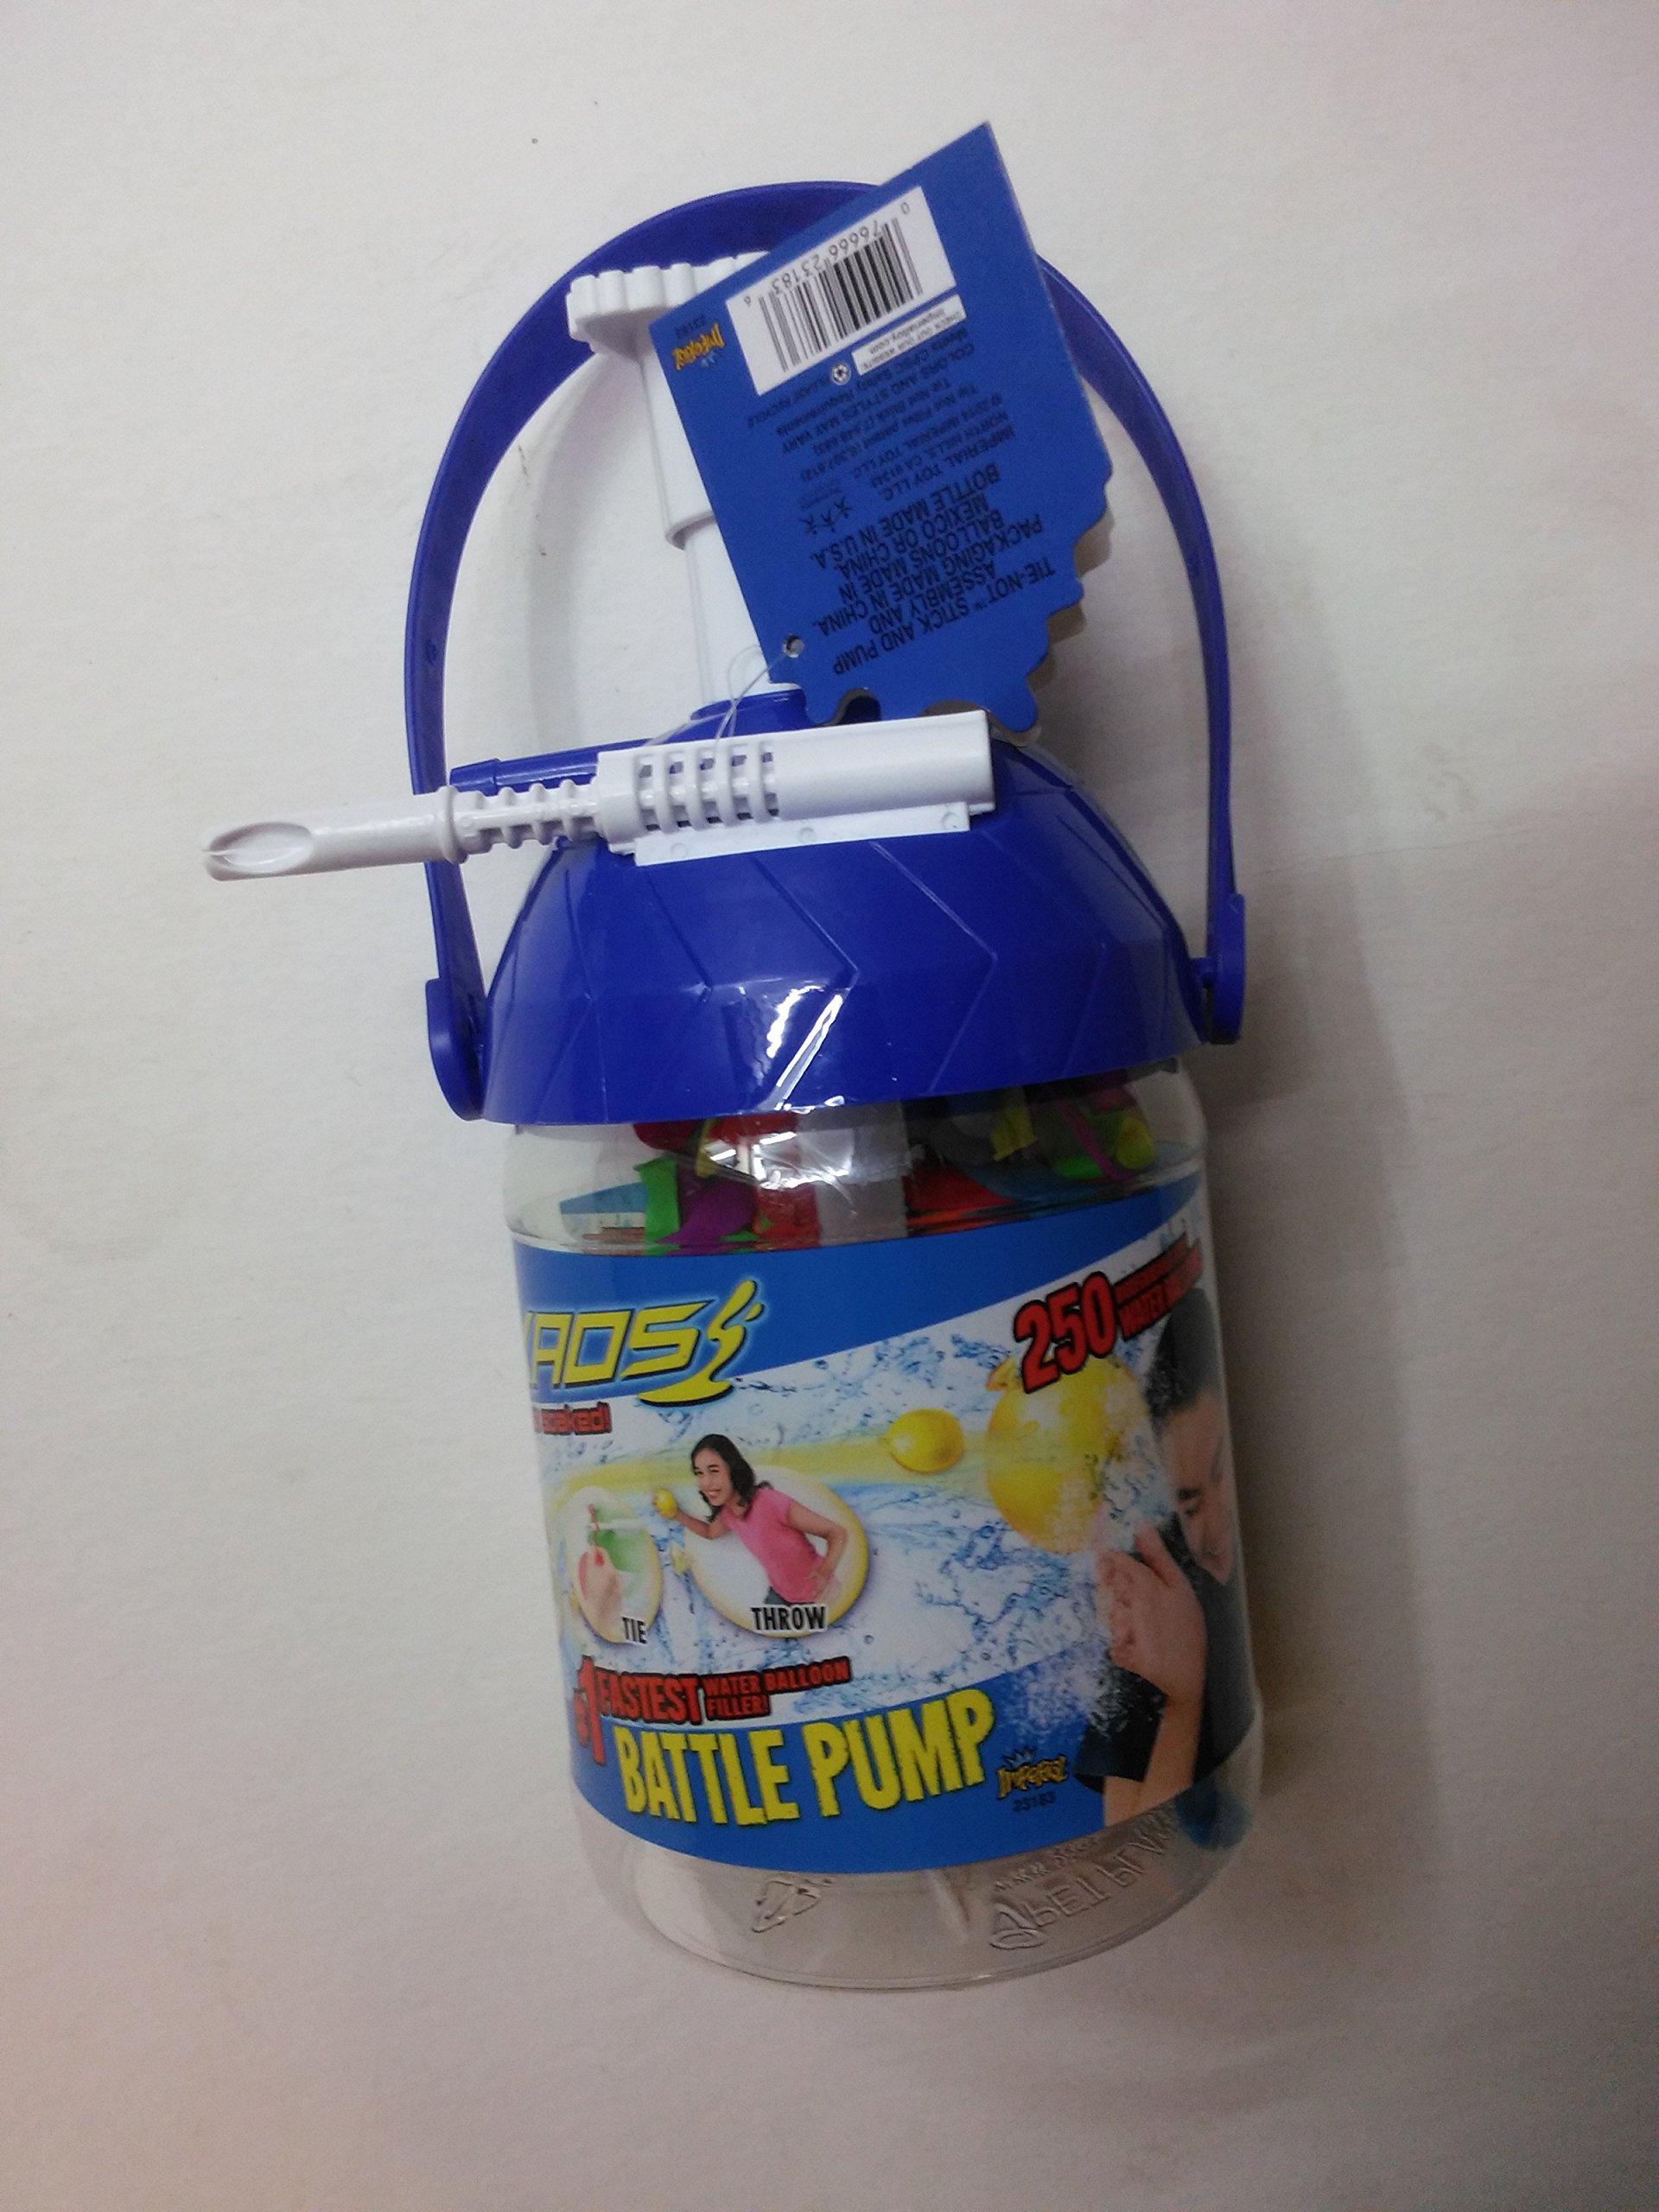 KAOS Tie Not Stick Pump #1 Fastest Warer Balloon Filler Battle Pump ( Color May Vary )